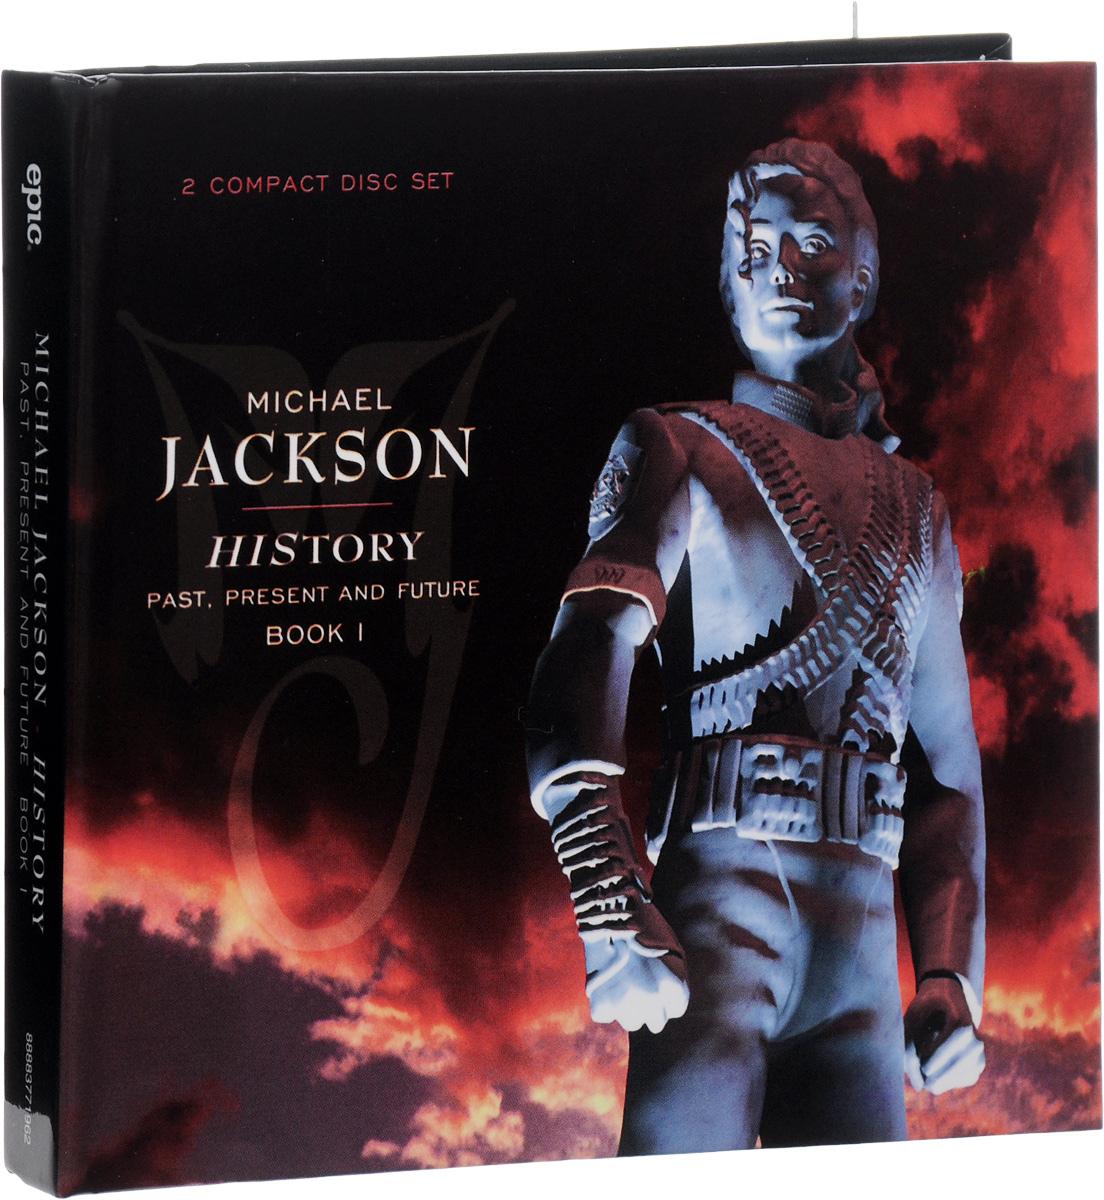 Майкл Джексон Michael Jackson. History - Past. Present And Future Book 1 (2 CD) michael jackson scream cd